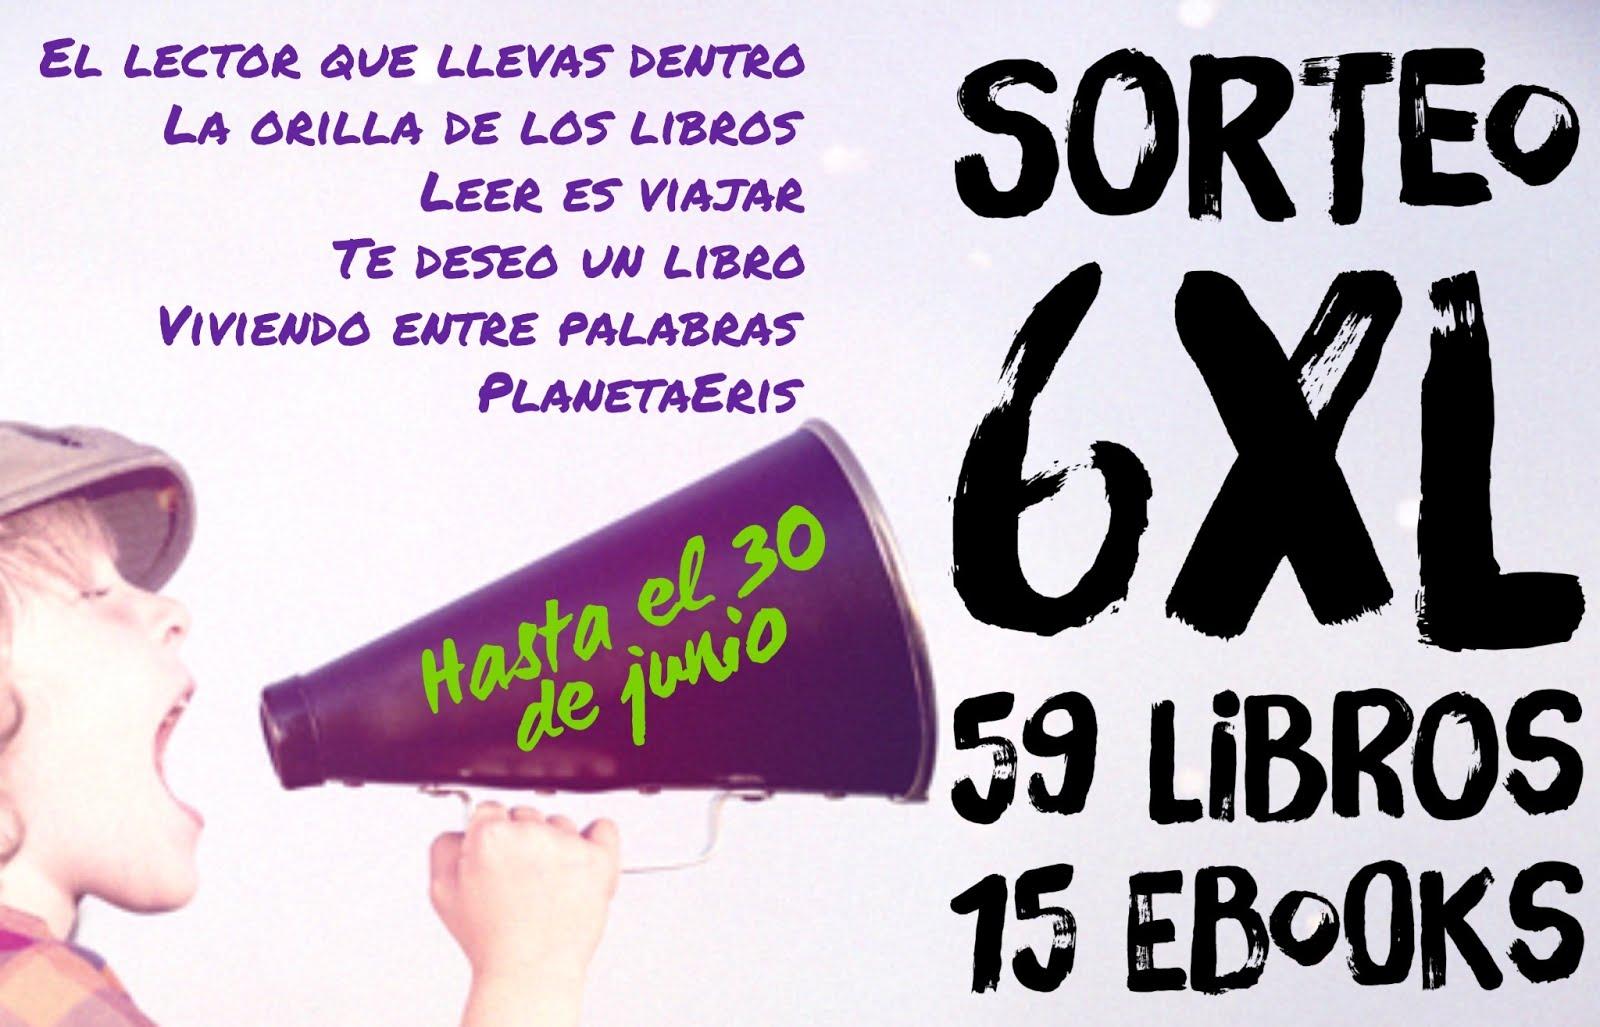 Sorteo 6 XL: 59 libros 15 ebooks